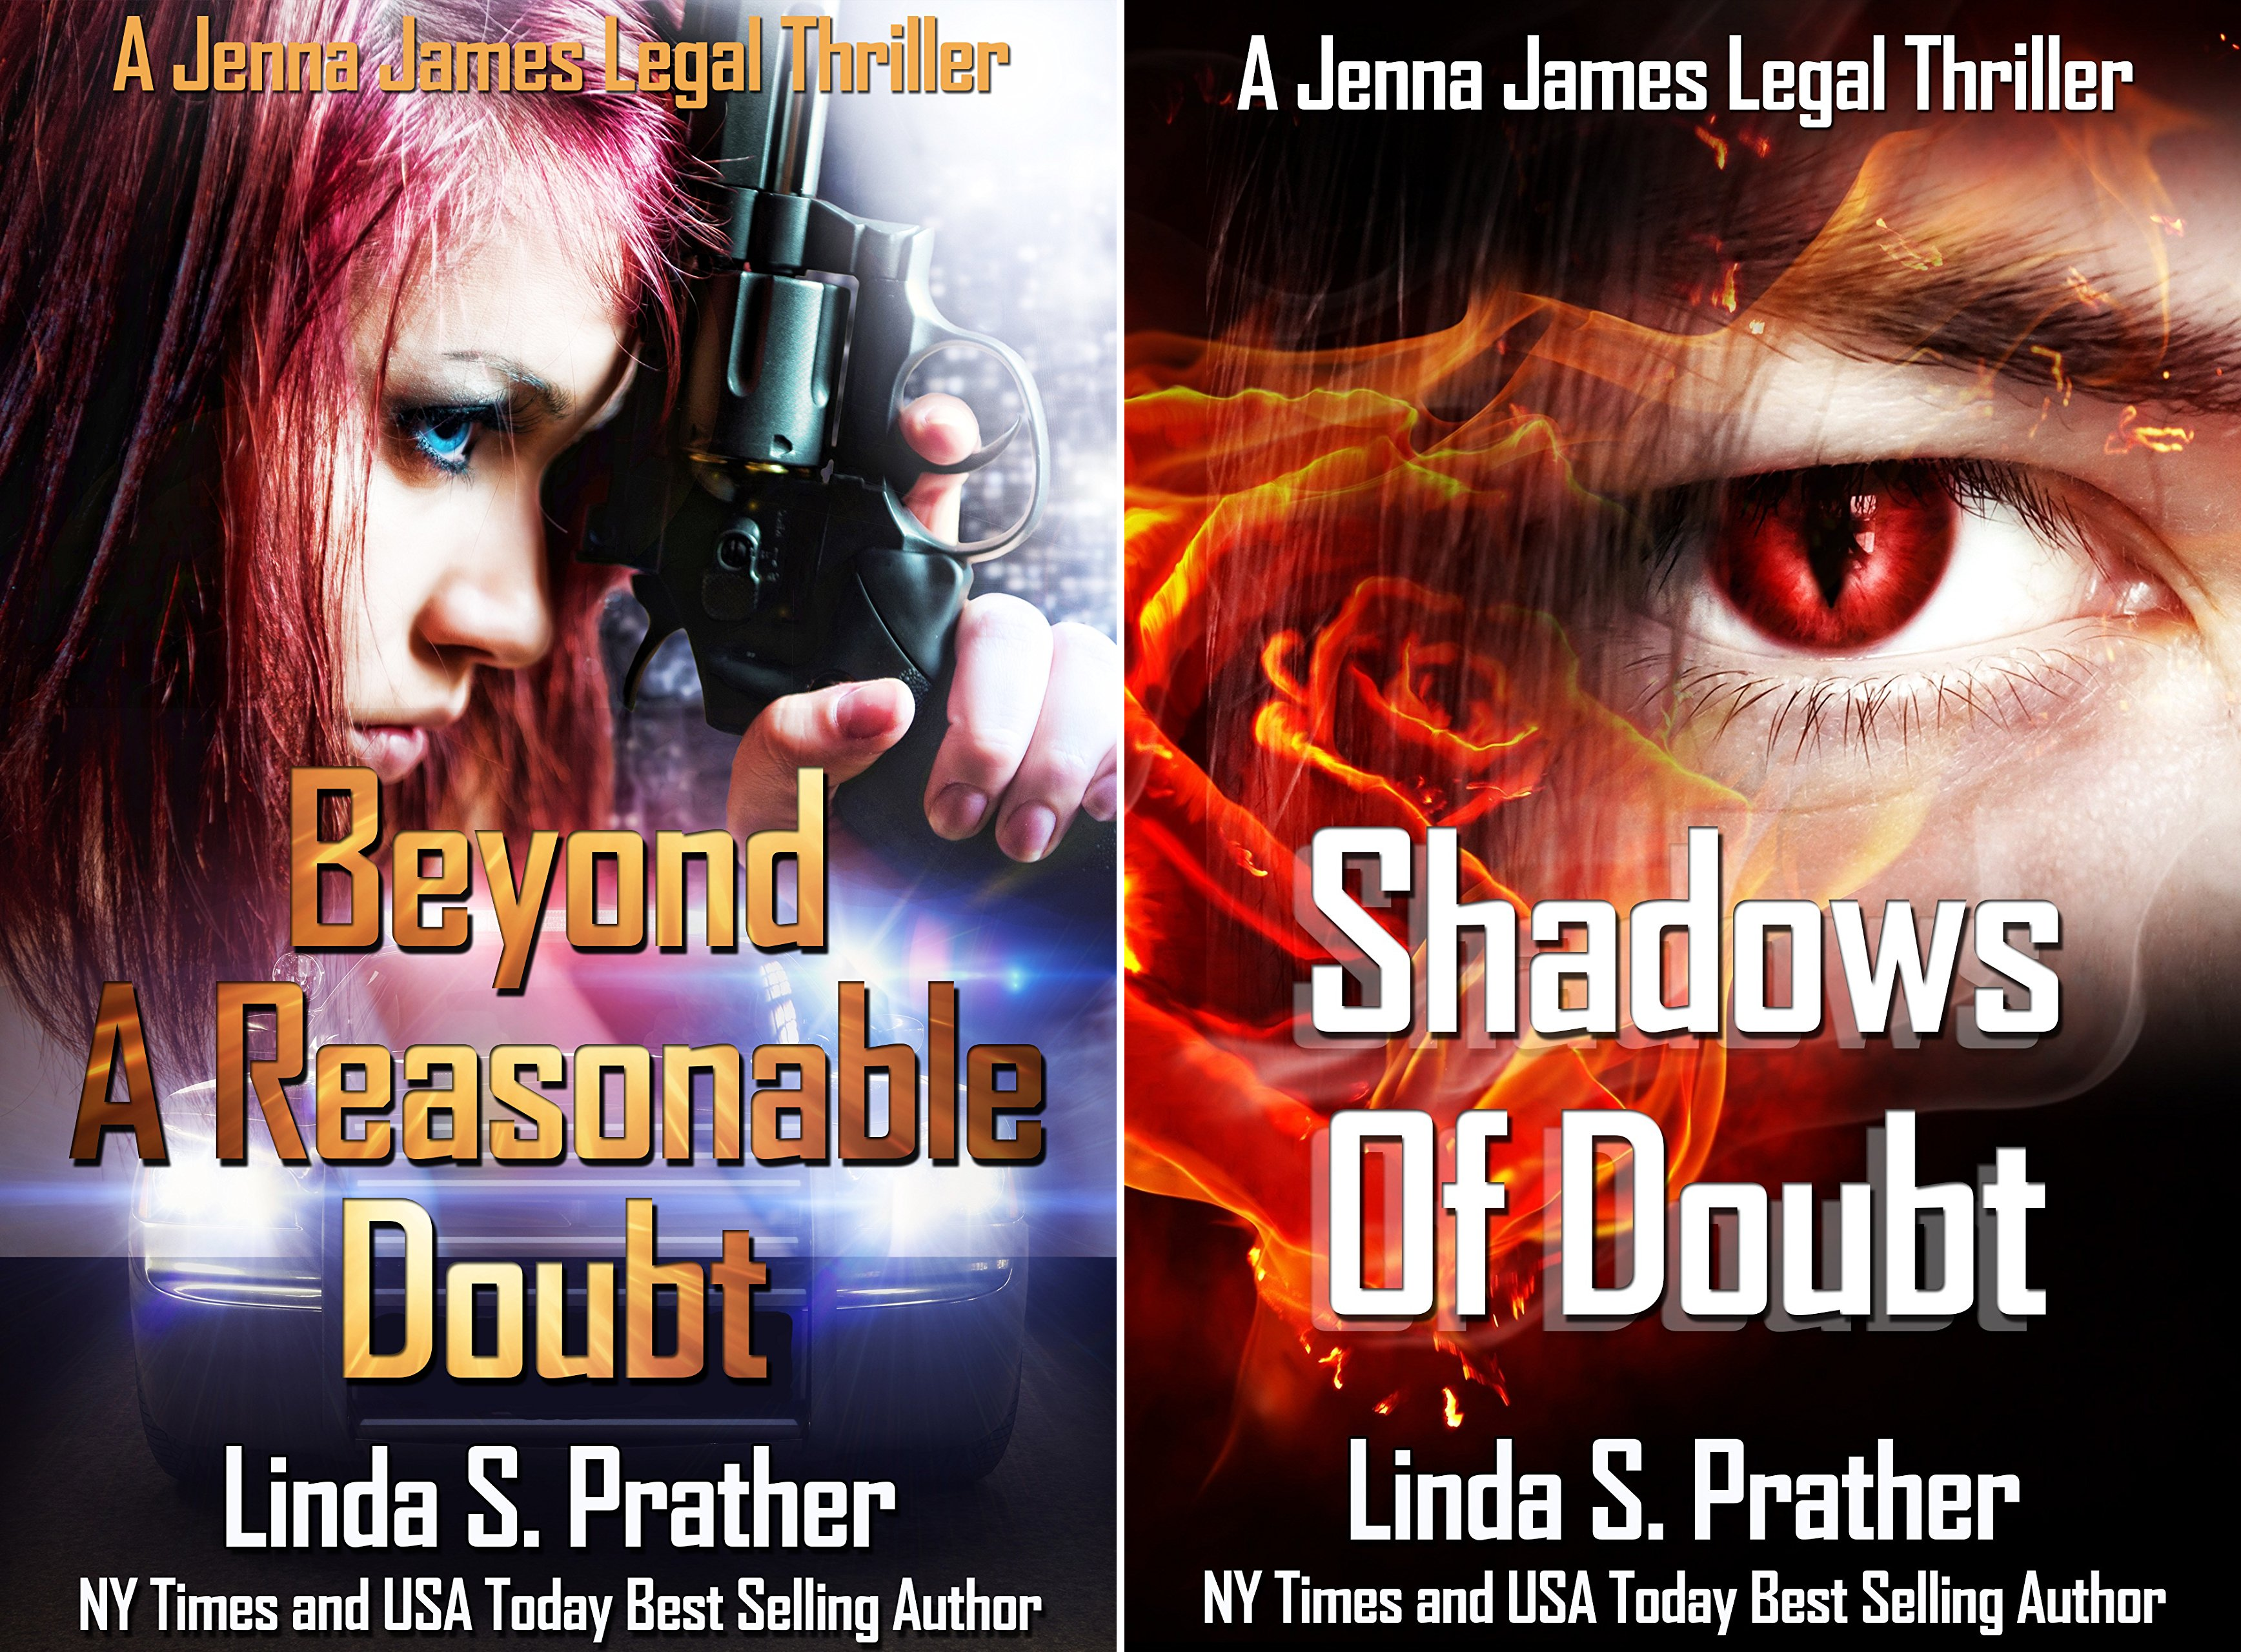 Jenna James Legal Thriller (2 Book Series)